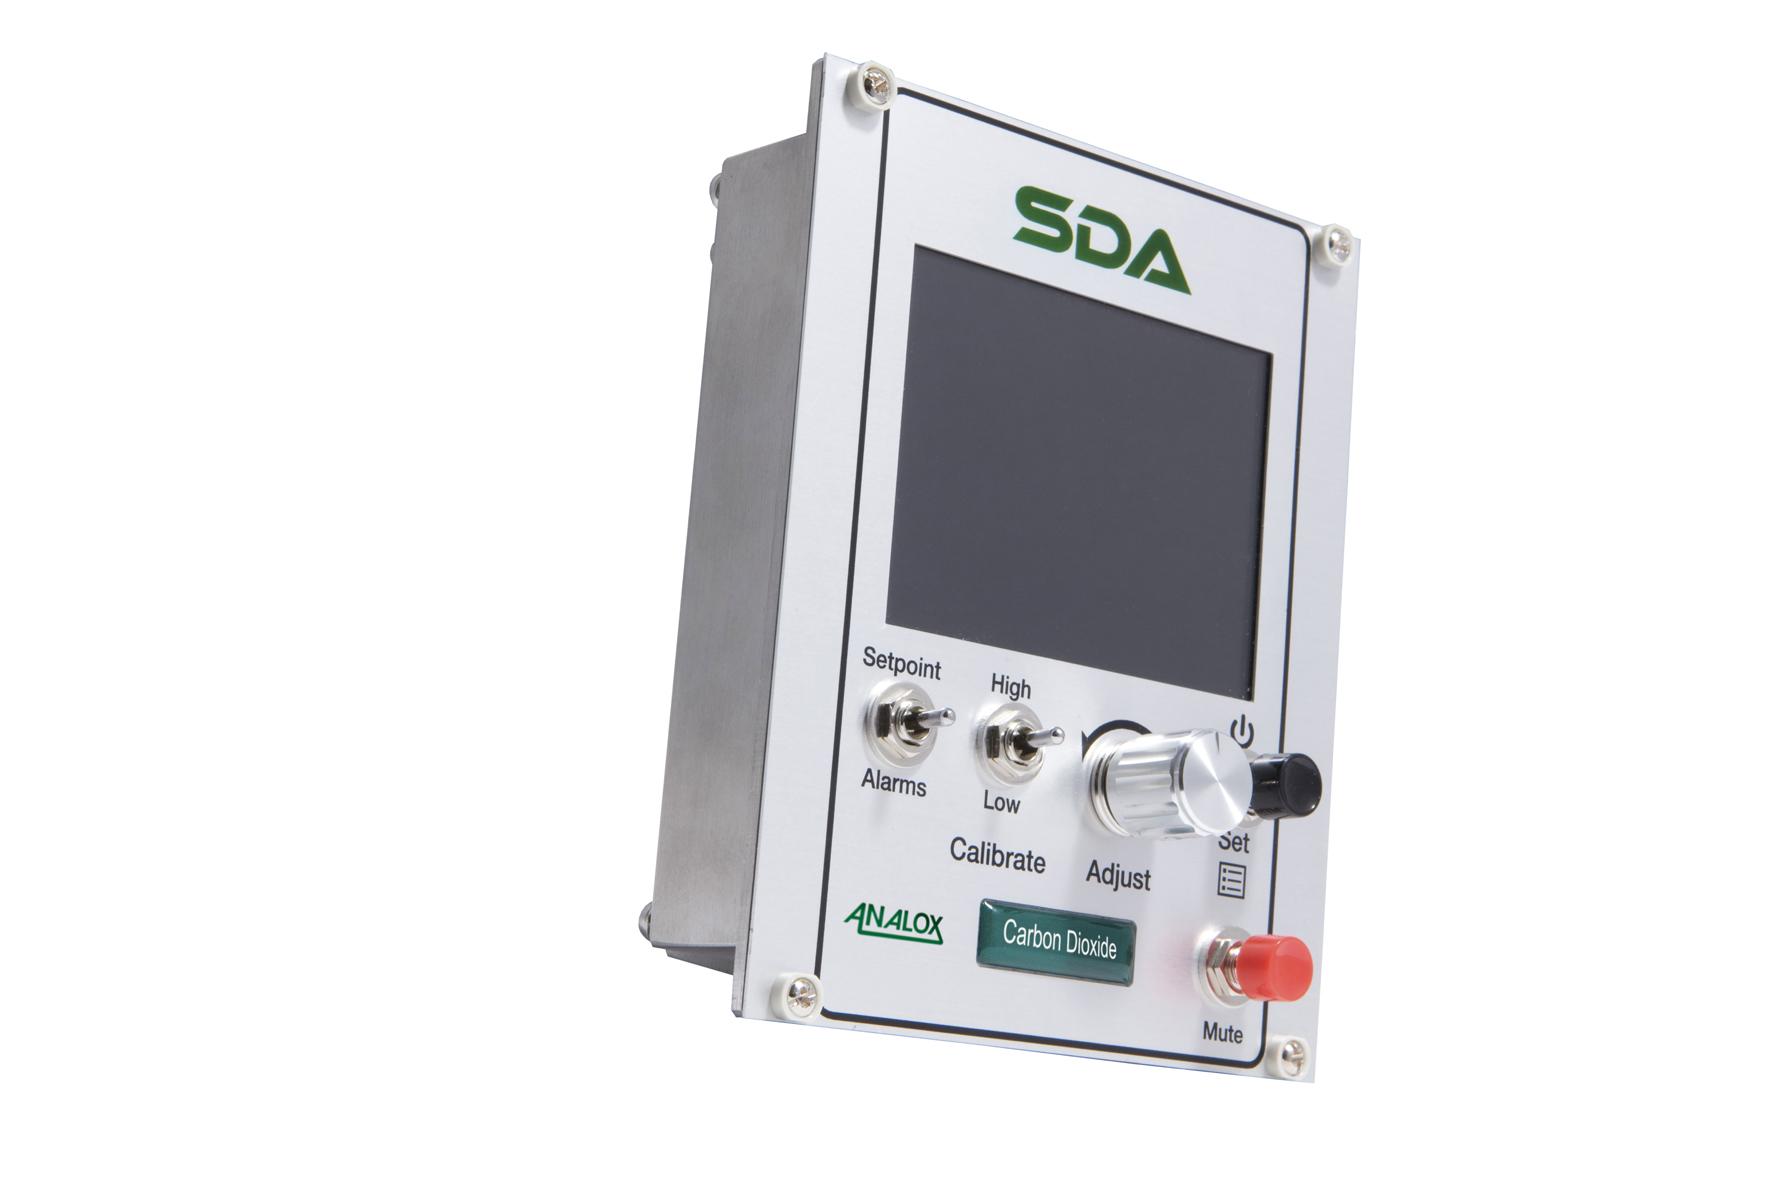 Jfd Analox Sda Co2 Analyser